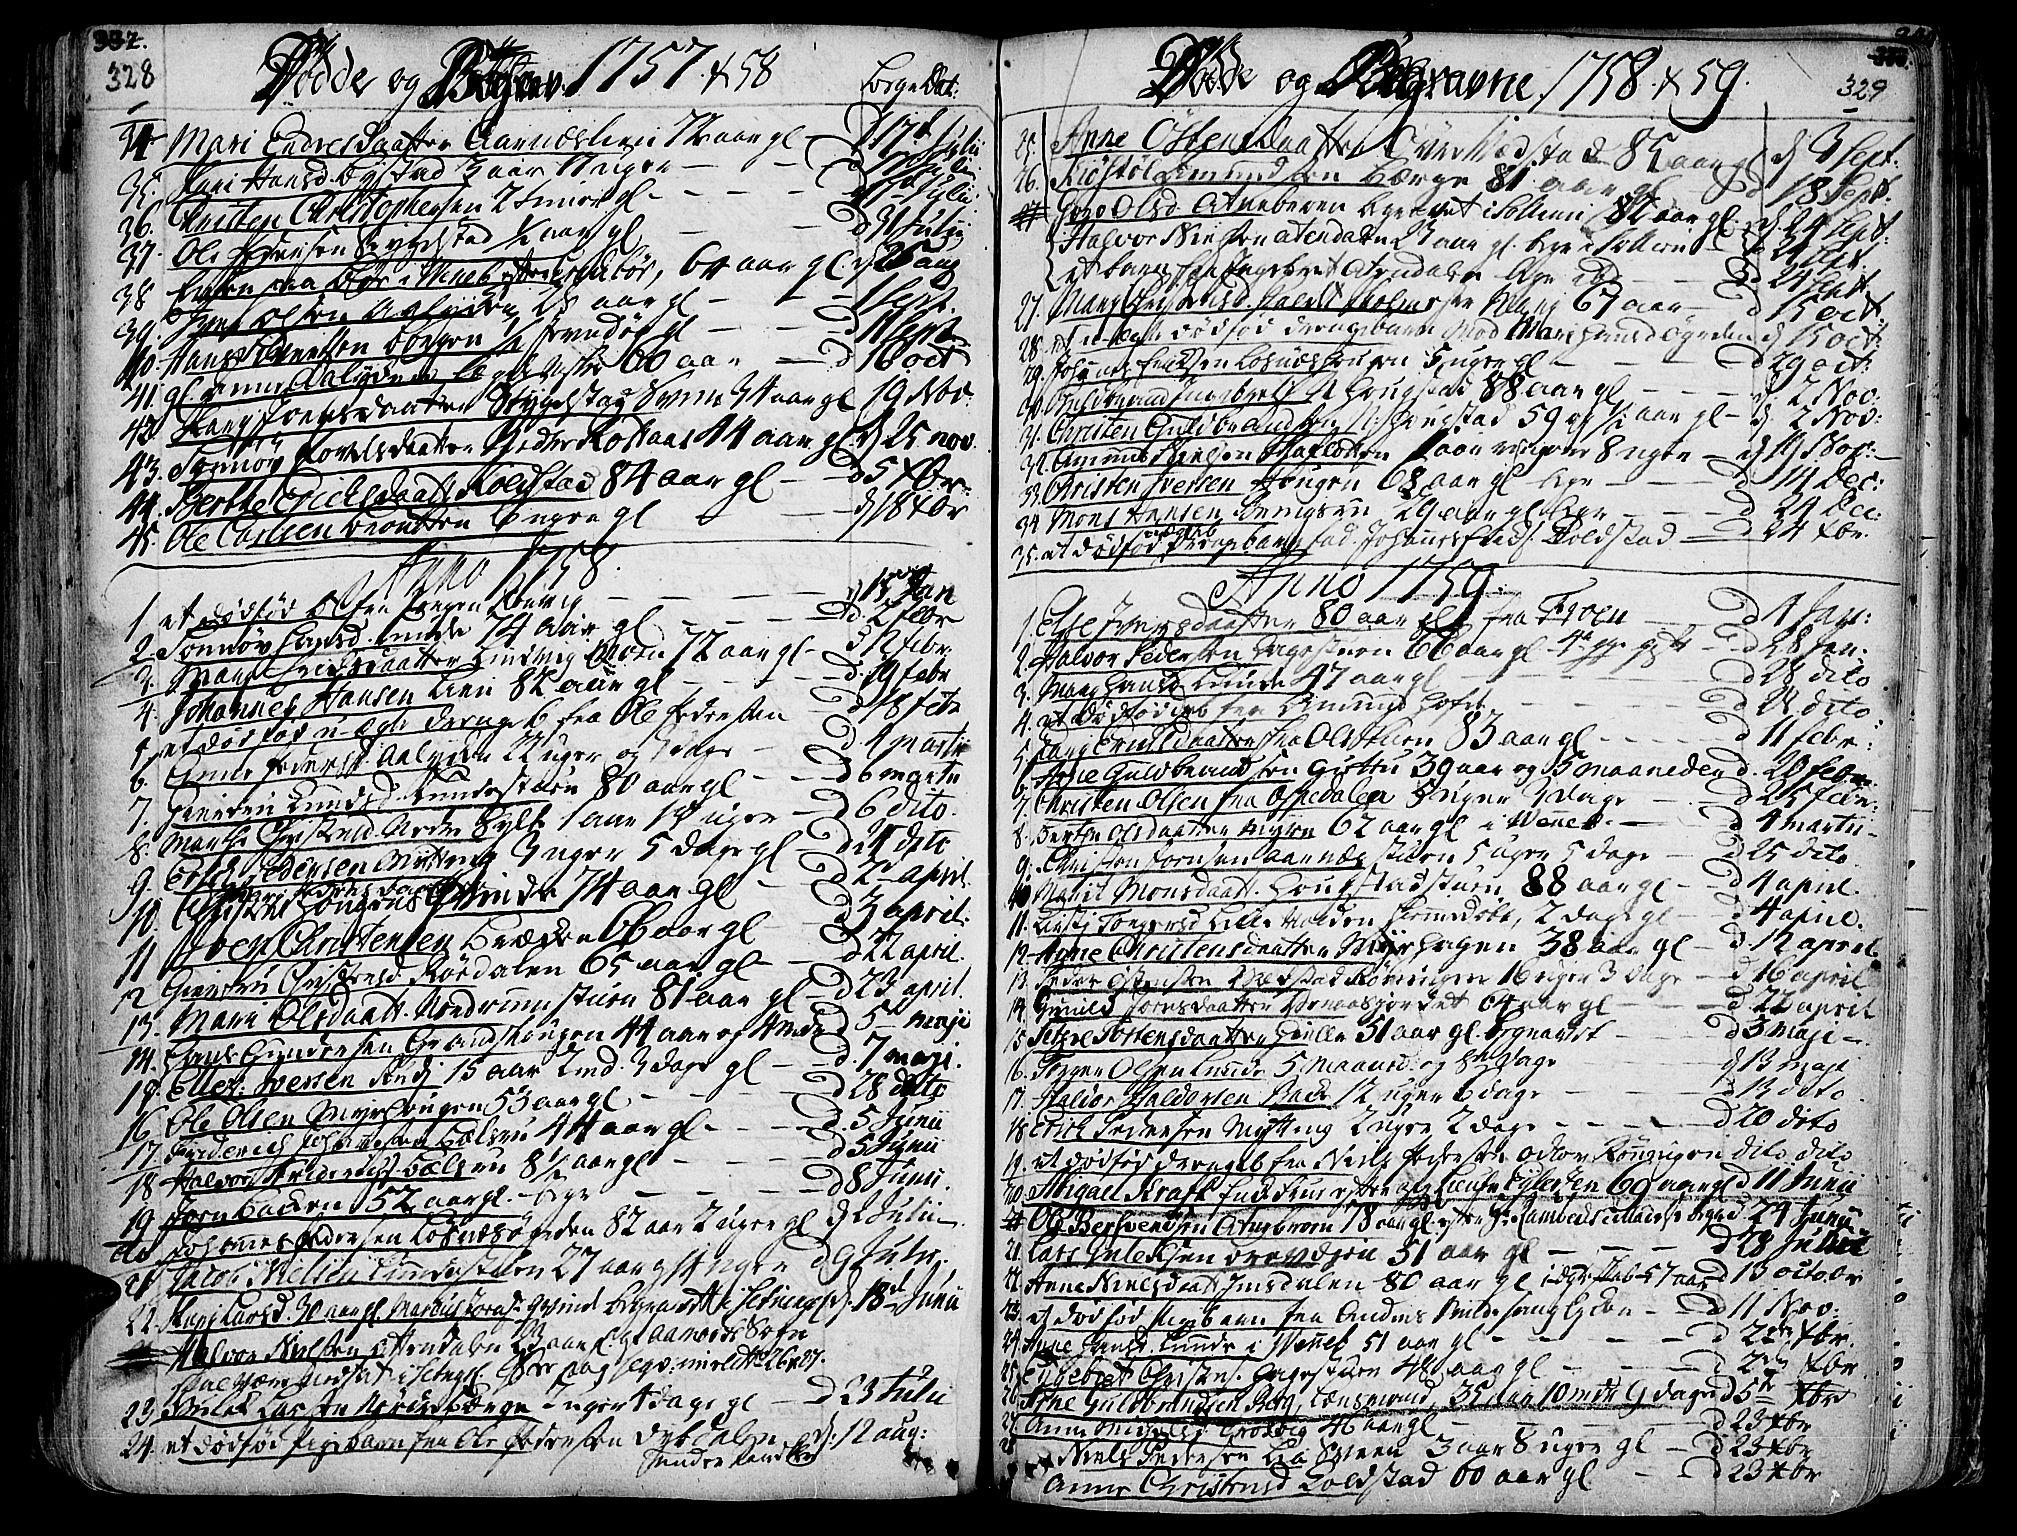 SAH, Ringebu prestekontor, Ministerialbok nr. 2, 1734-1780, s. 328-329